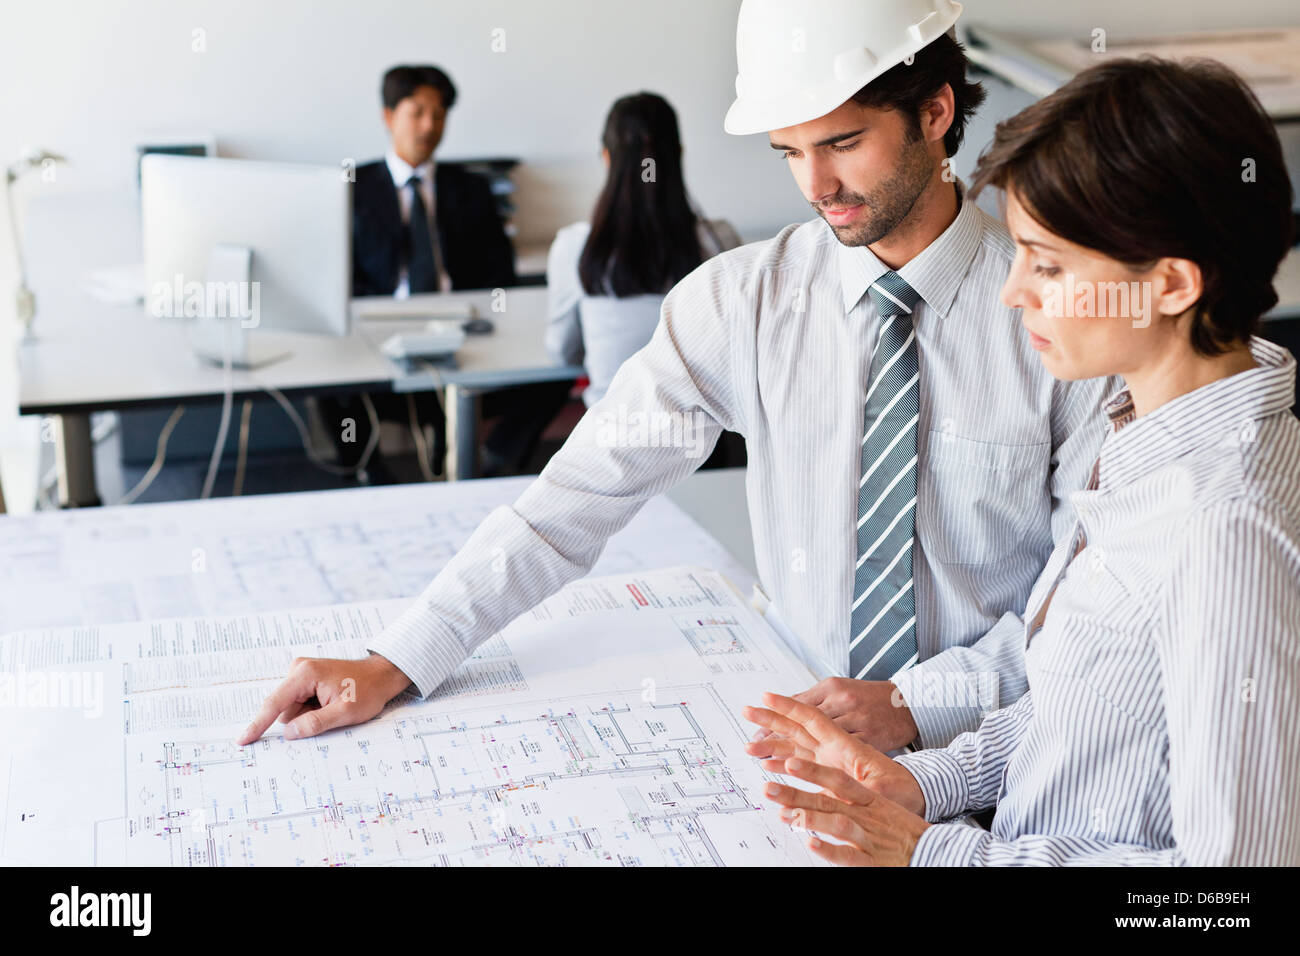 Business people reading blueprints - Stock Image